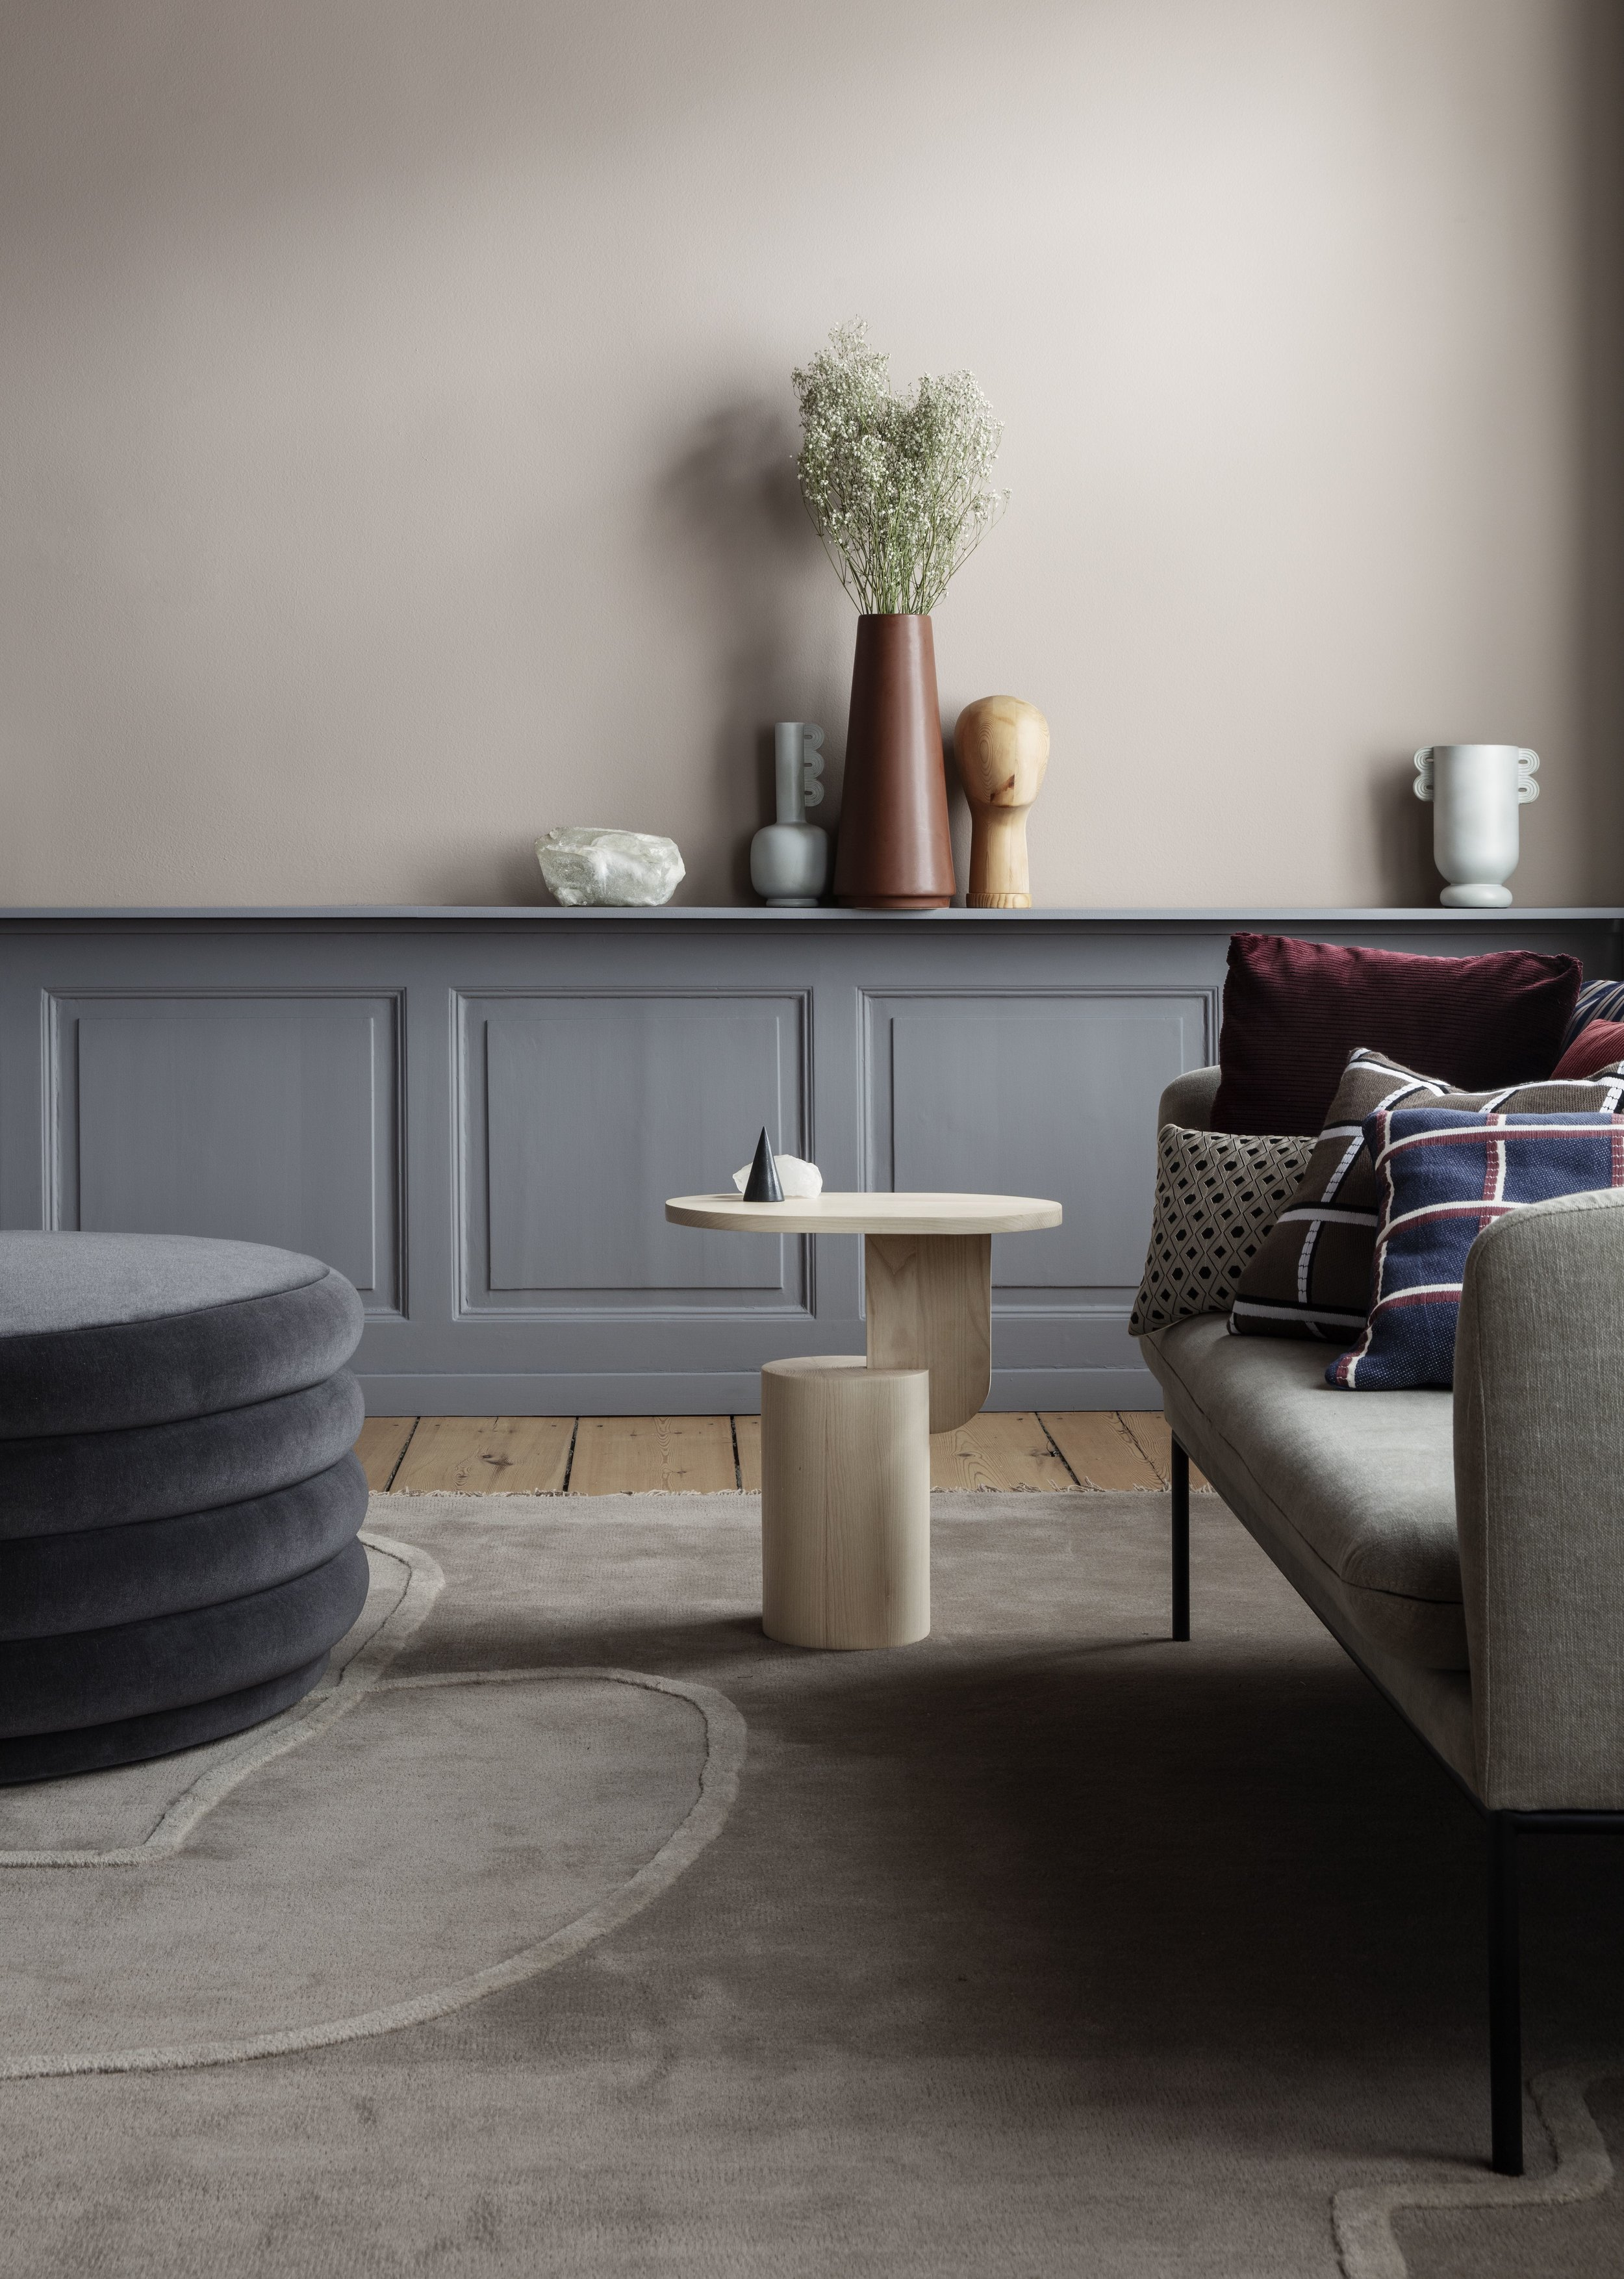 insert side table, ferm living, interiors, furniture, scandinavian design 1.jpg